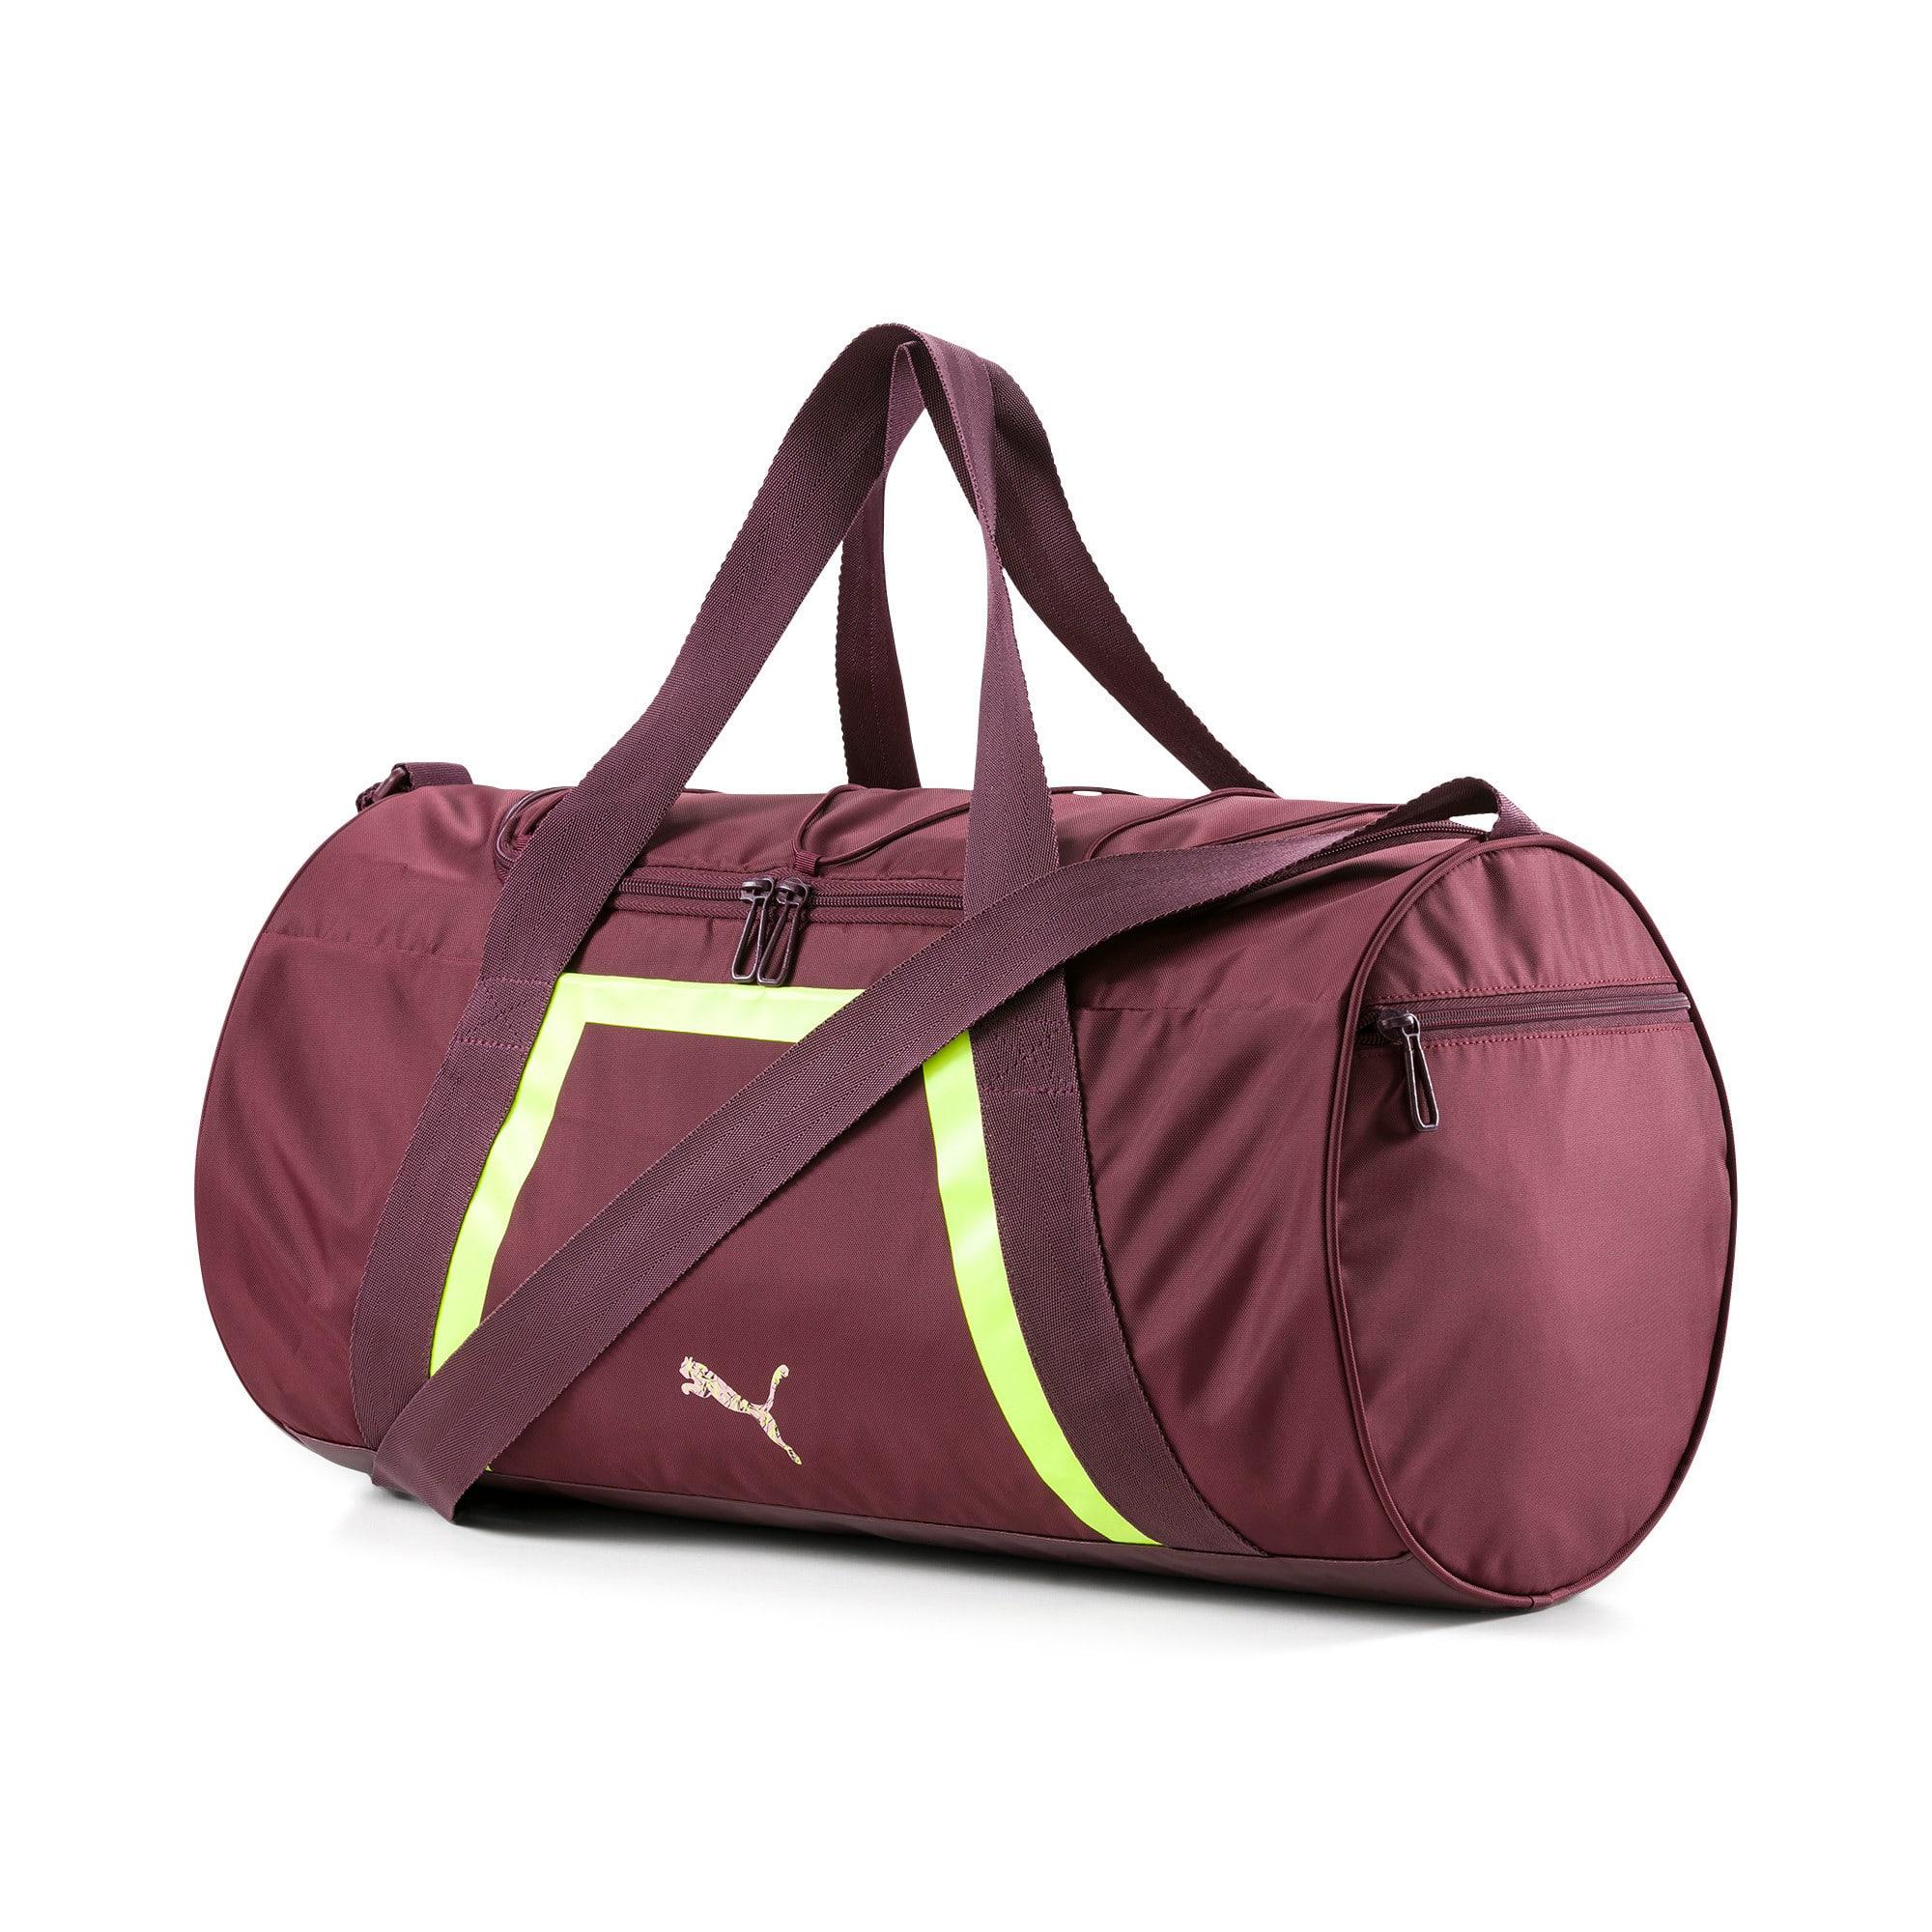 Thumbnail 1 of Active Training Shift Women's Duffel Bag, Vineyard Wine-Yellow Alert, medium-IND